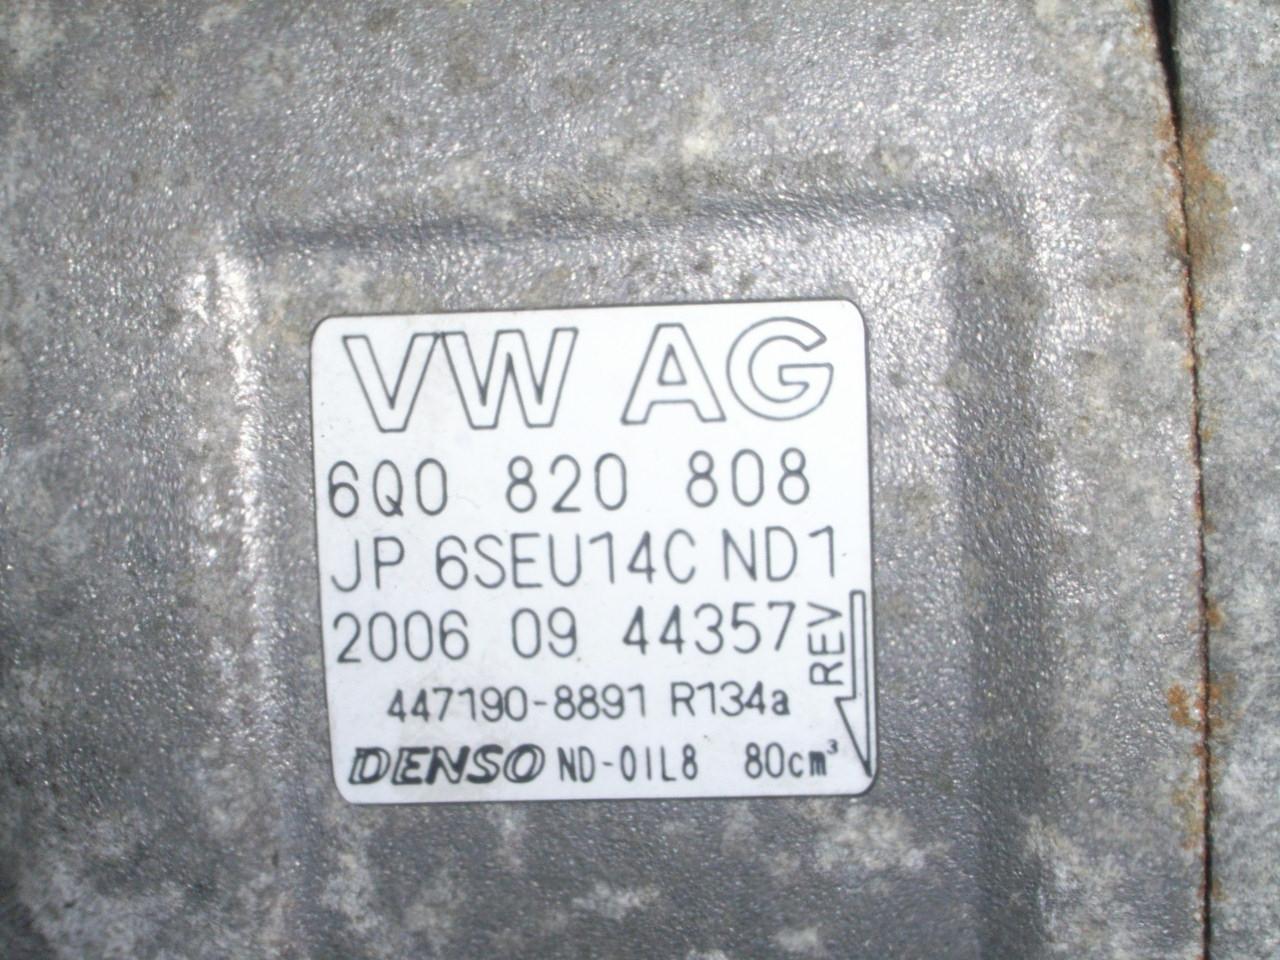 Ac Compressor Vw Polo 9n 16 16v 311573 Kompresor Denso 6q0820808 Vag Kurzes Kabel